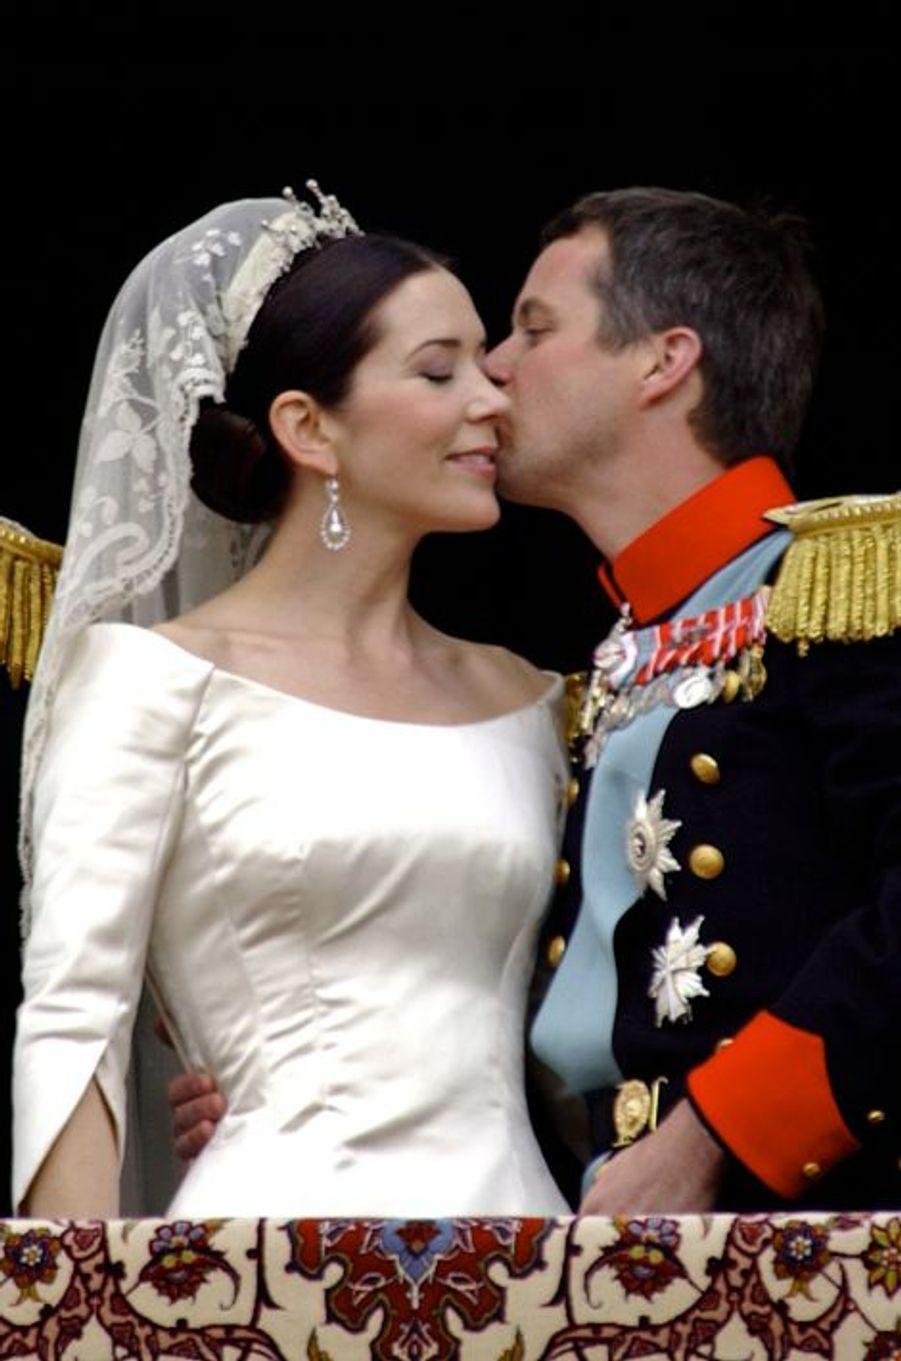 Mary épouse le prince Frederik de Danemark le 14 mai 2004